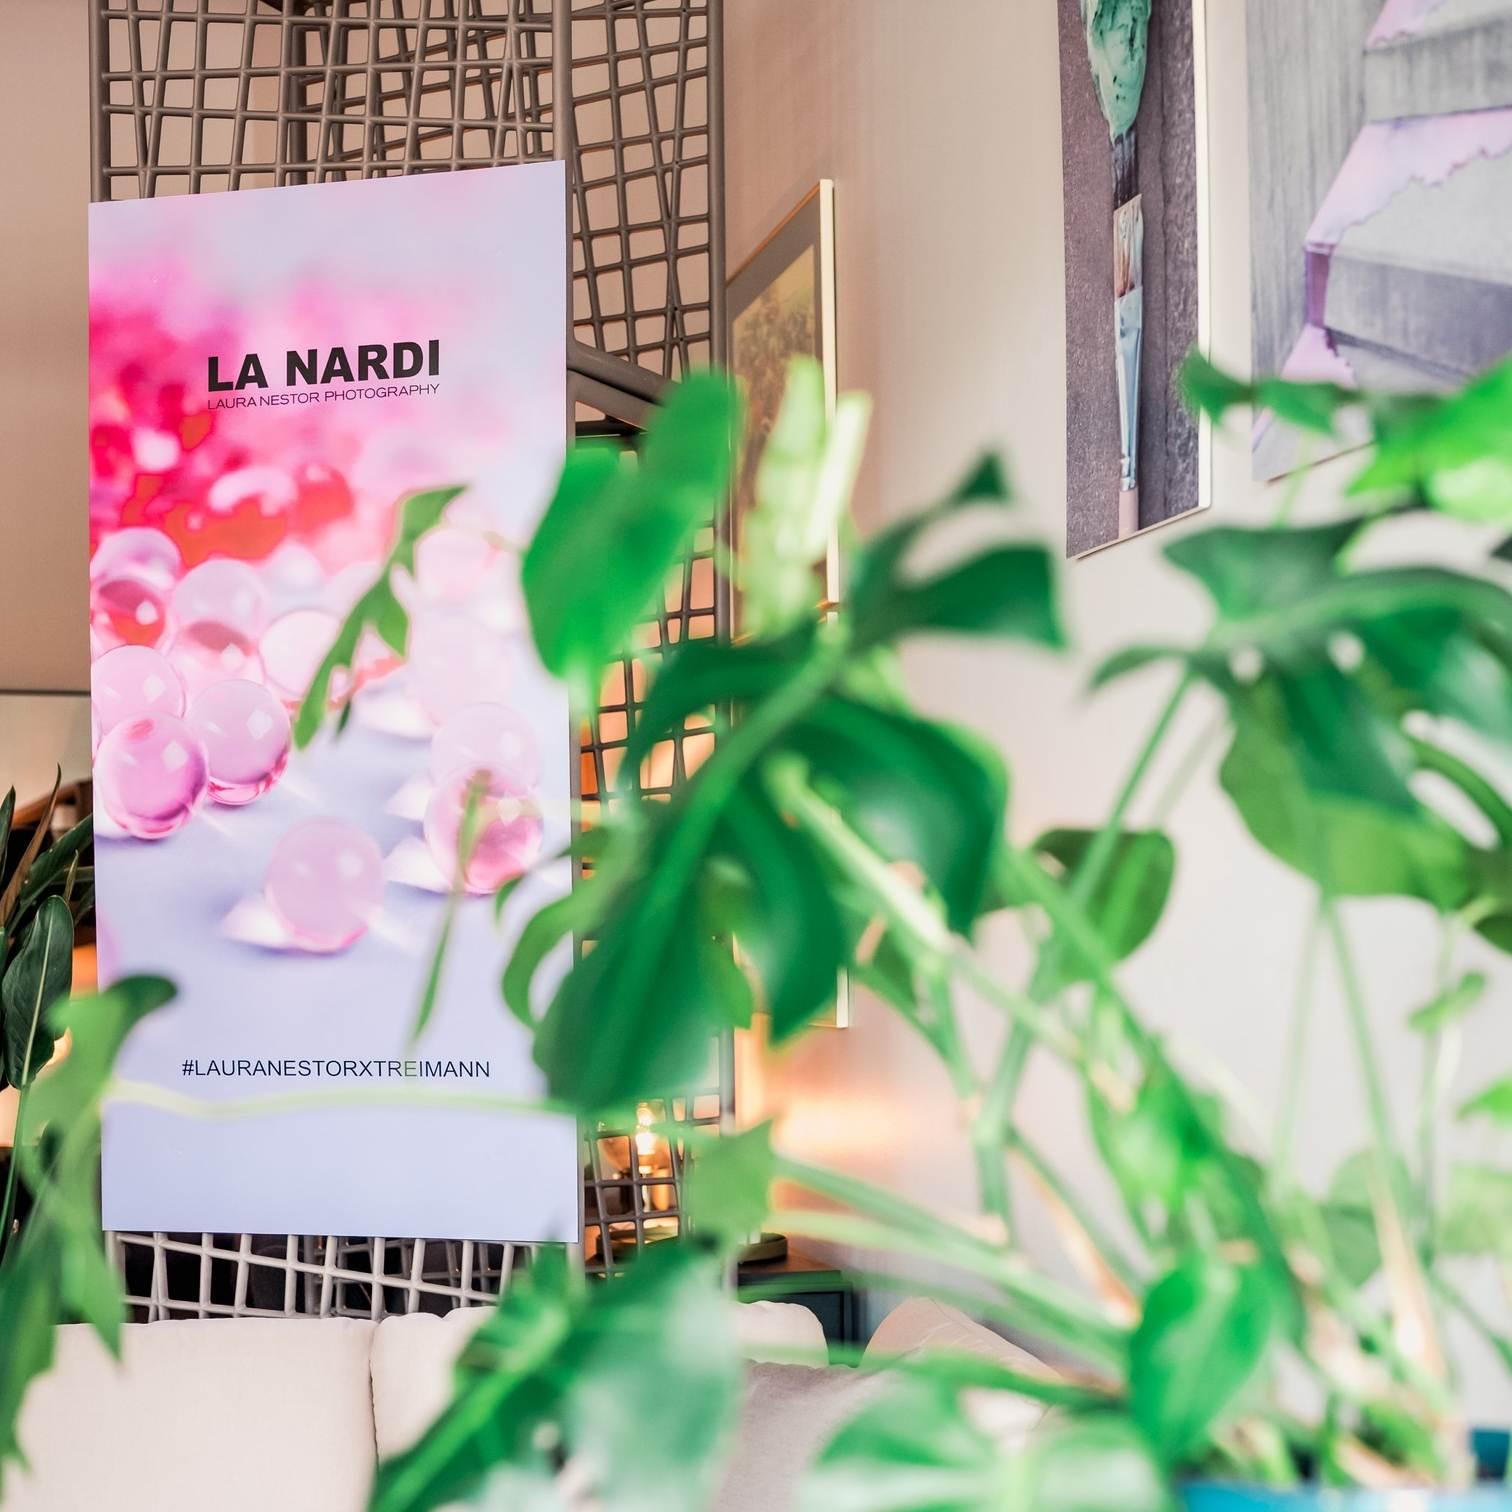 Laura Nestor Photography ja Treimann mööblisalong esitlevad fotonäitust LA NARDI